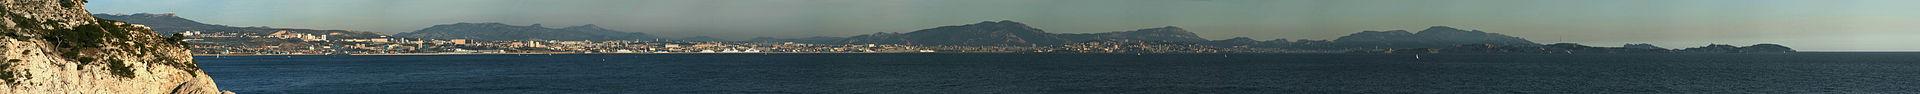 Marseille vu de La Vesse.jpg